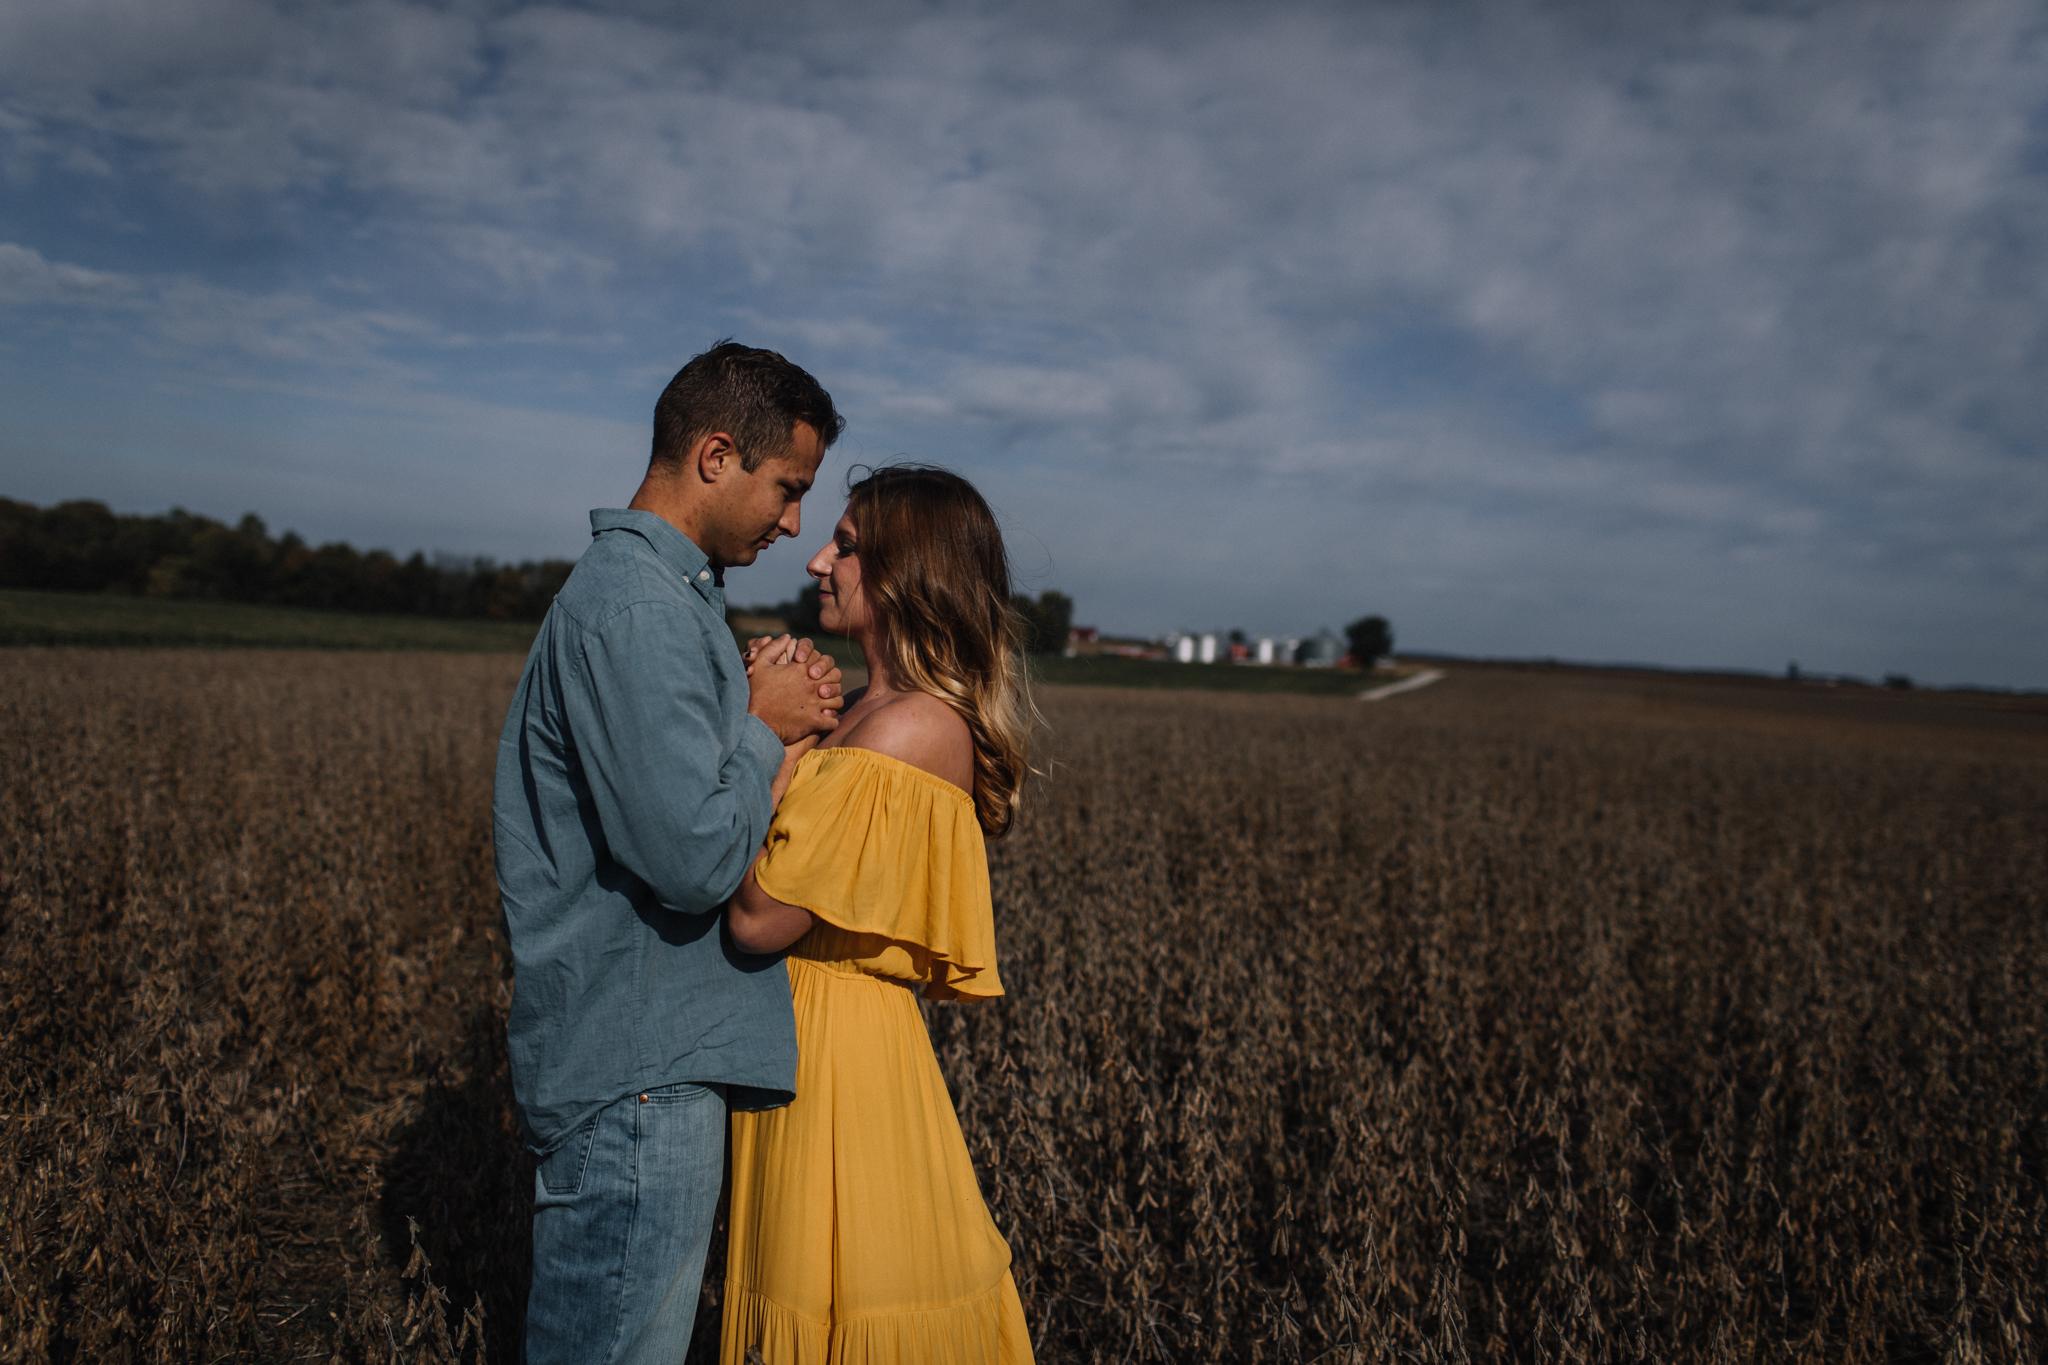 billie-shaye-style-photography-www.billieshayestyle.com-harsh-light-couples-session-nashville-tennessee-6969.jpg